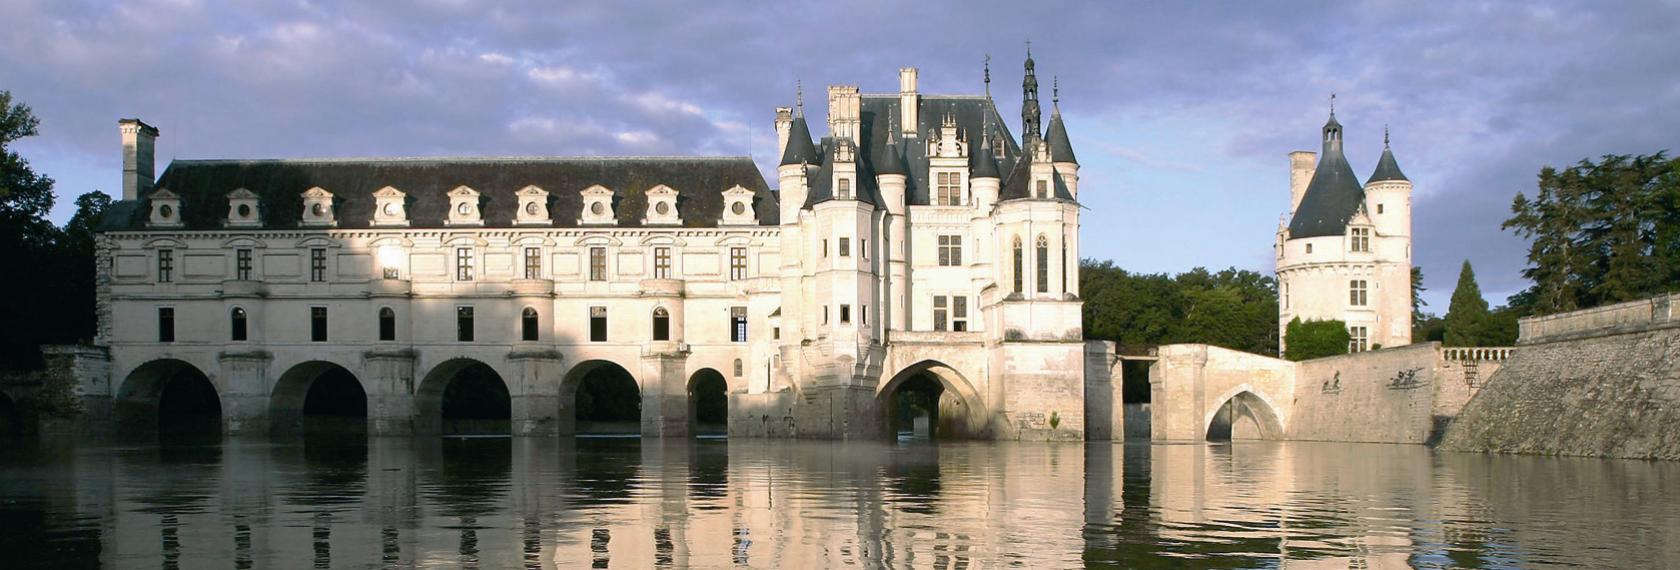 Promo chateau de la loire